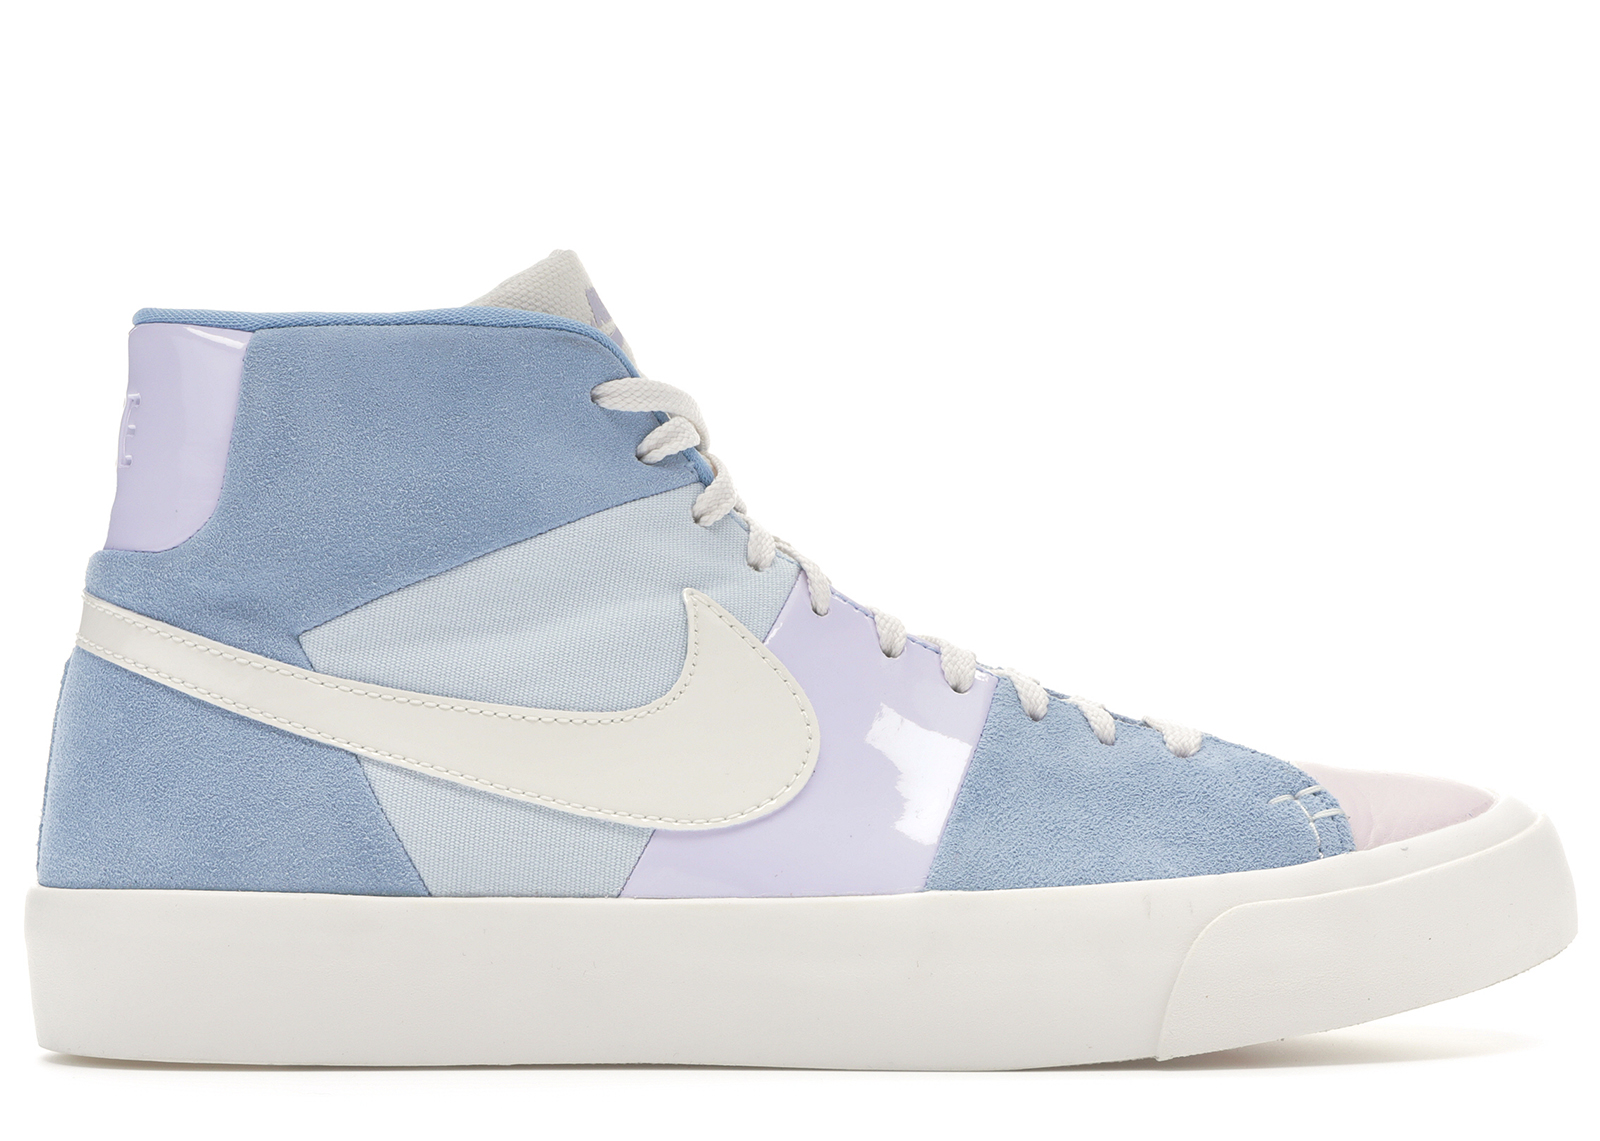 Nike Blazer Royal Easter (2018